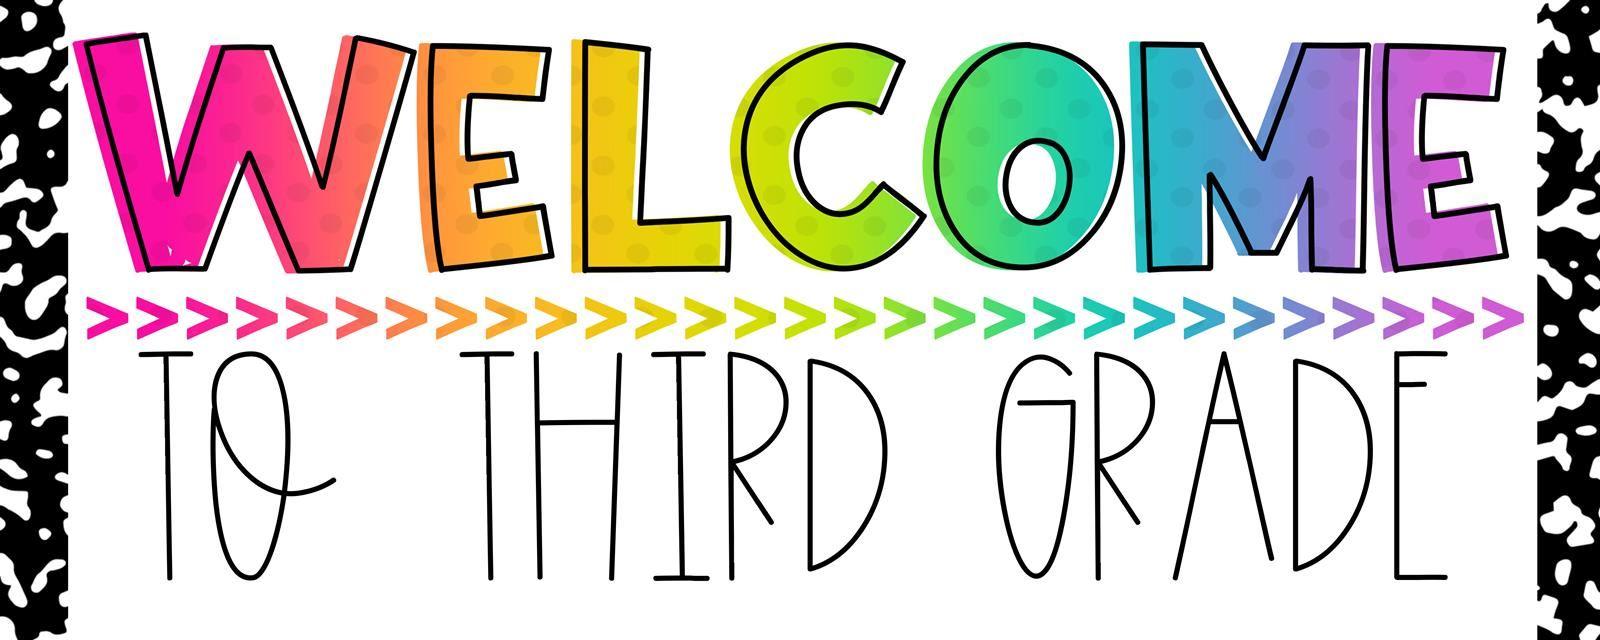 Welcome - Ramos, Anissa - Mater Gardens Academy